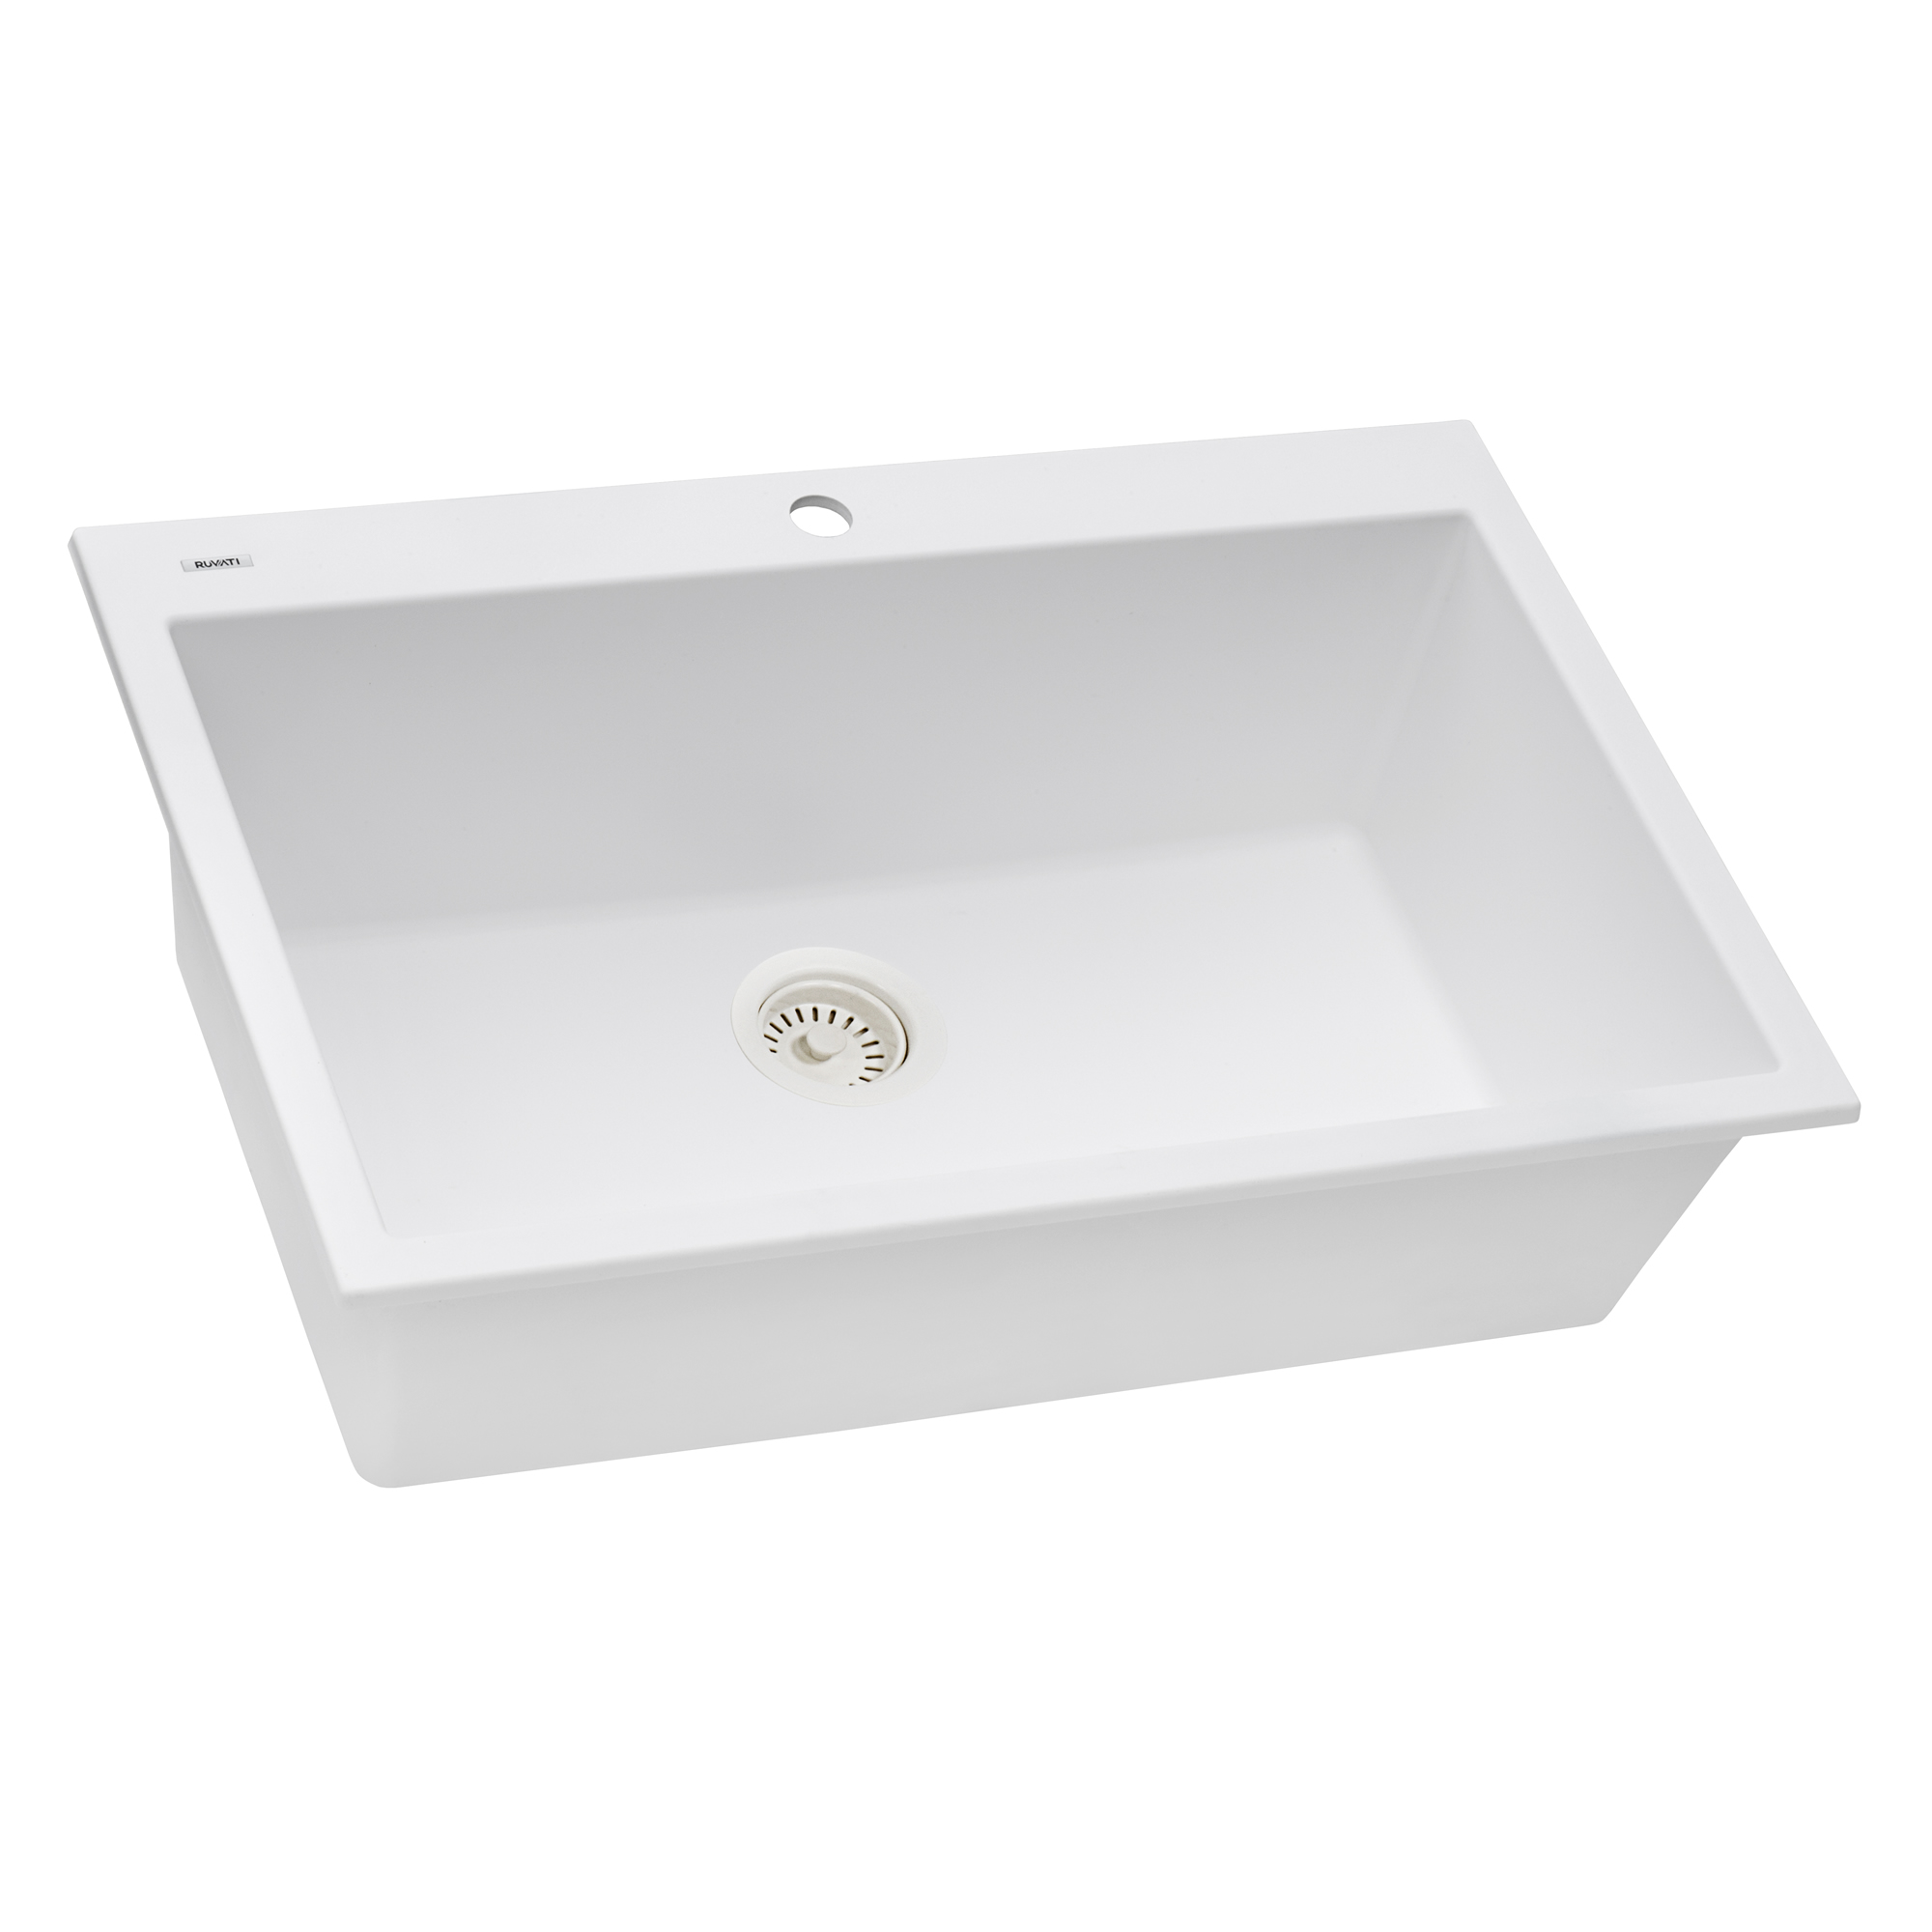 Ruvati 30 X 20 Inch Epigranite Drop In Topmount Granite Composite Single Bowl Kitchen Sink Arctic White Rvg1030wh Ruvati Usa